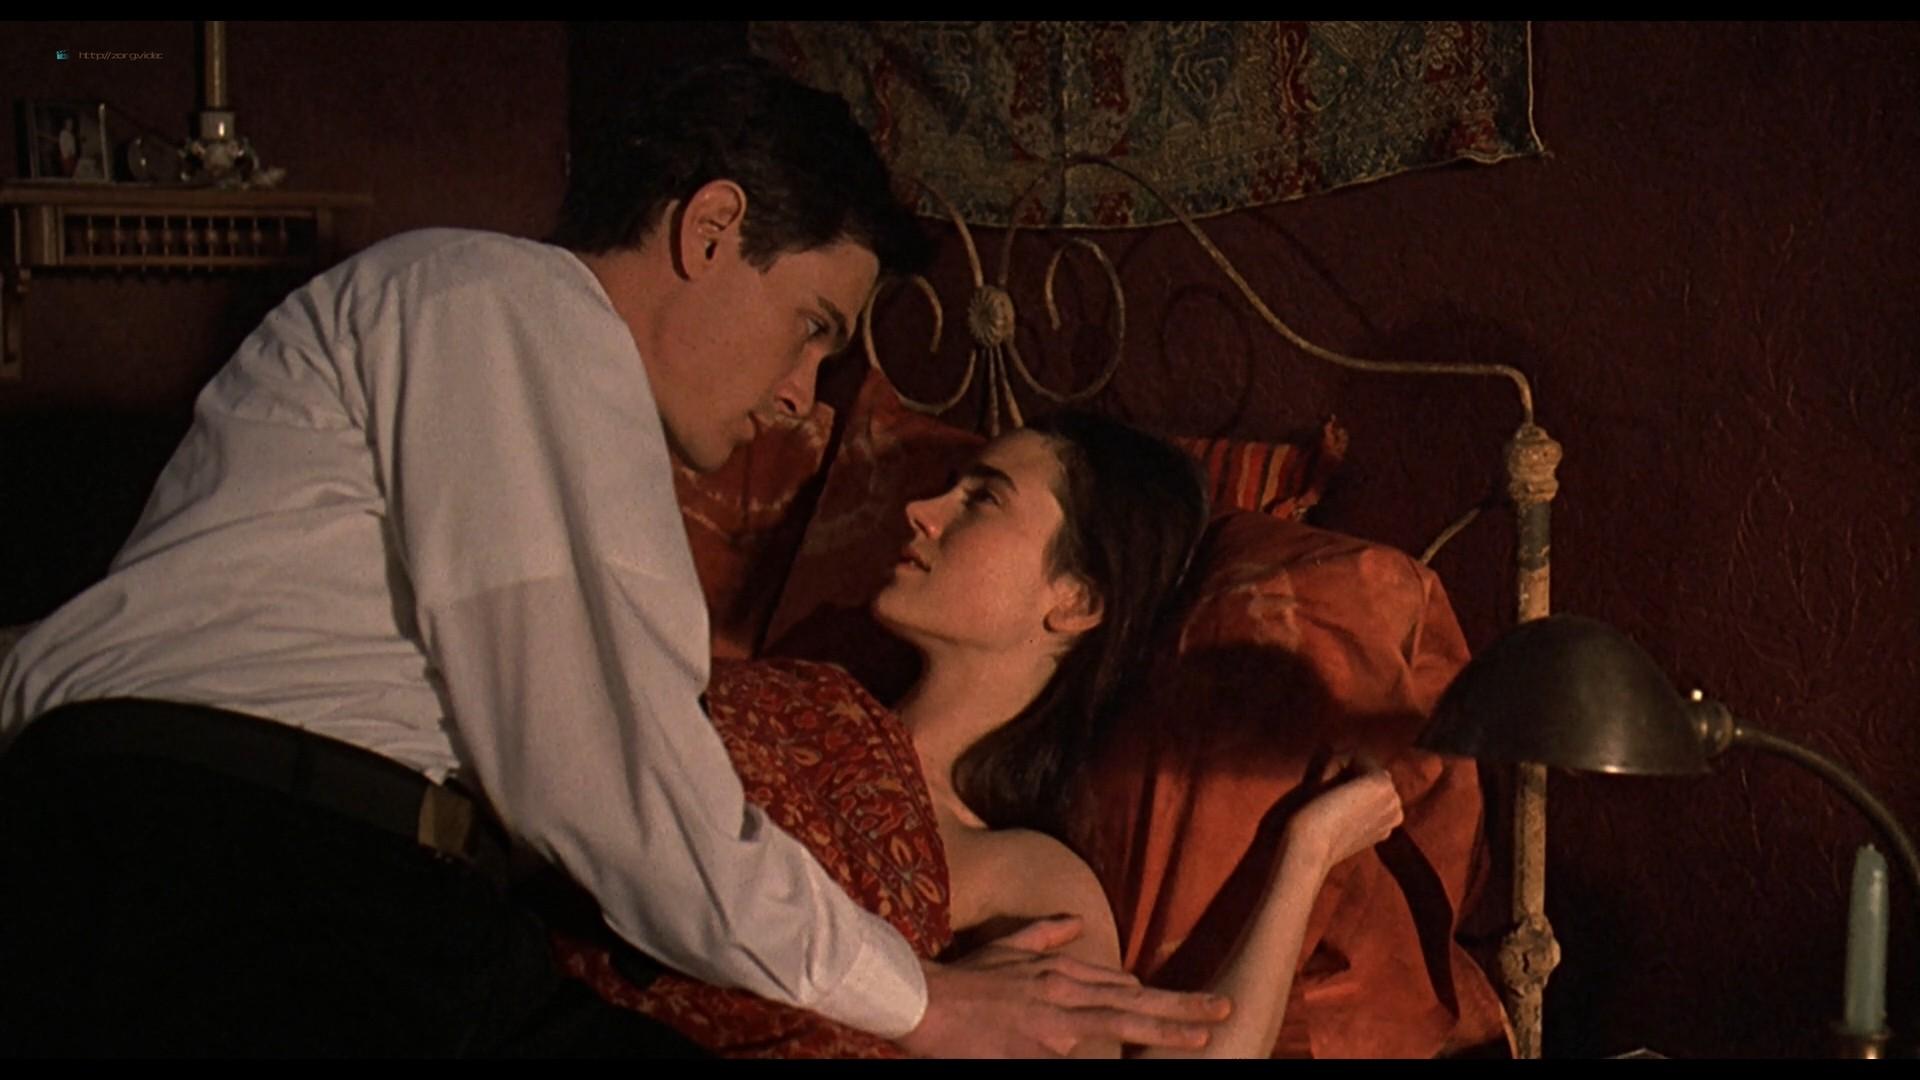 Jennifer Connelly nude side boob sex in – Waking the Dead (2000) HD 1080p BluRay (14)